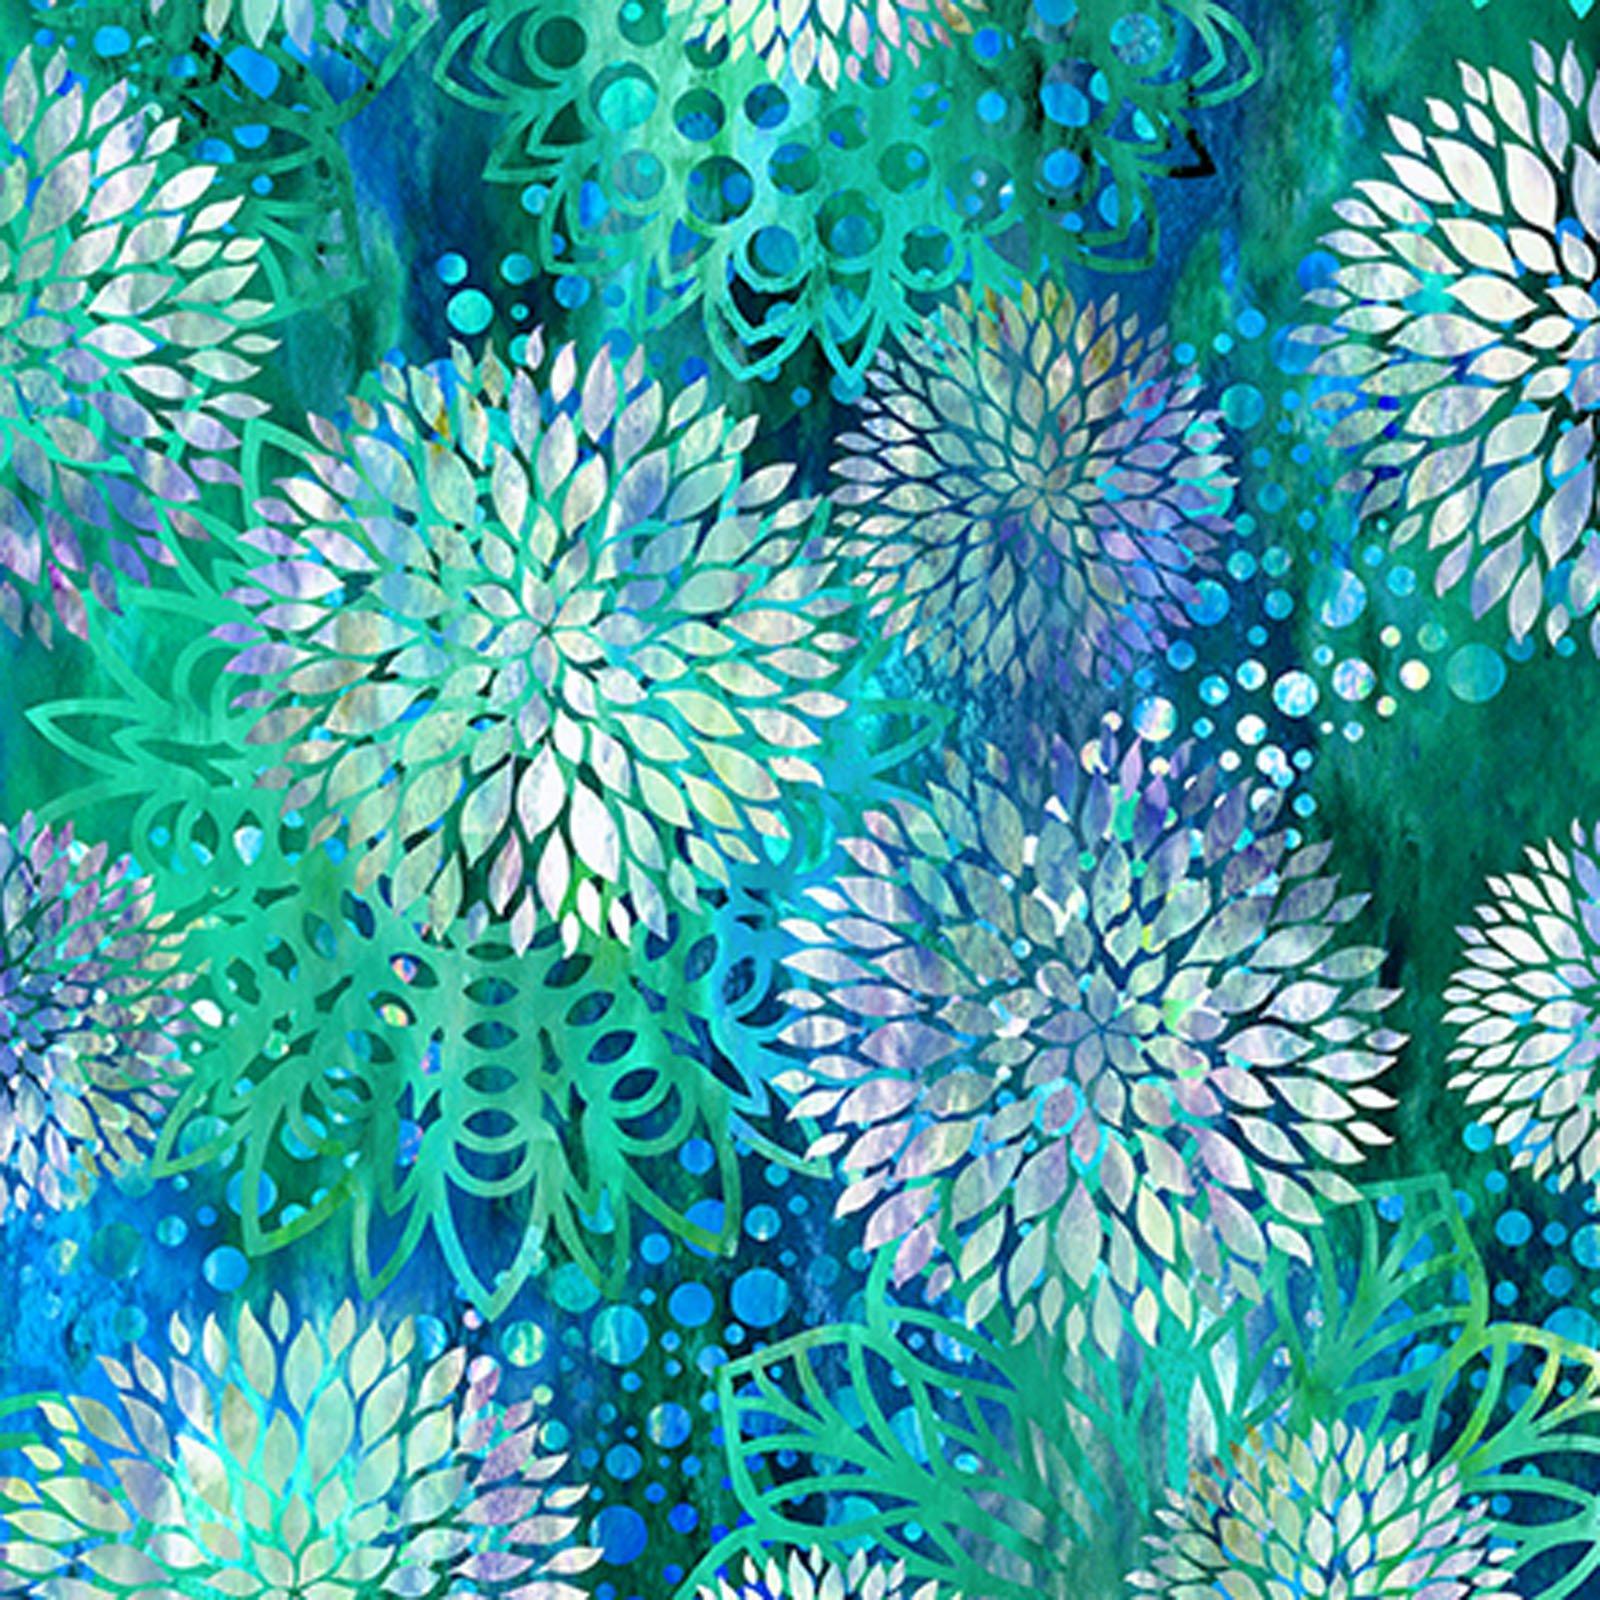 INTH-3FGE 2 - FLORAGRAPHIX V BY JASON YENTER CHRYSANTHEMUM BLUE